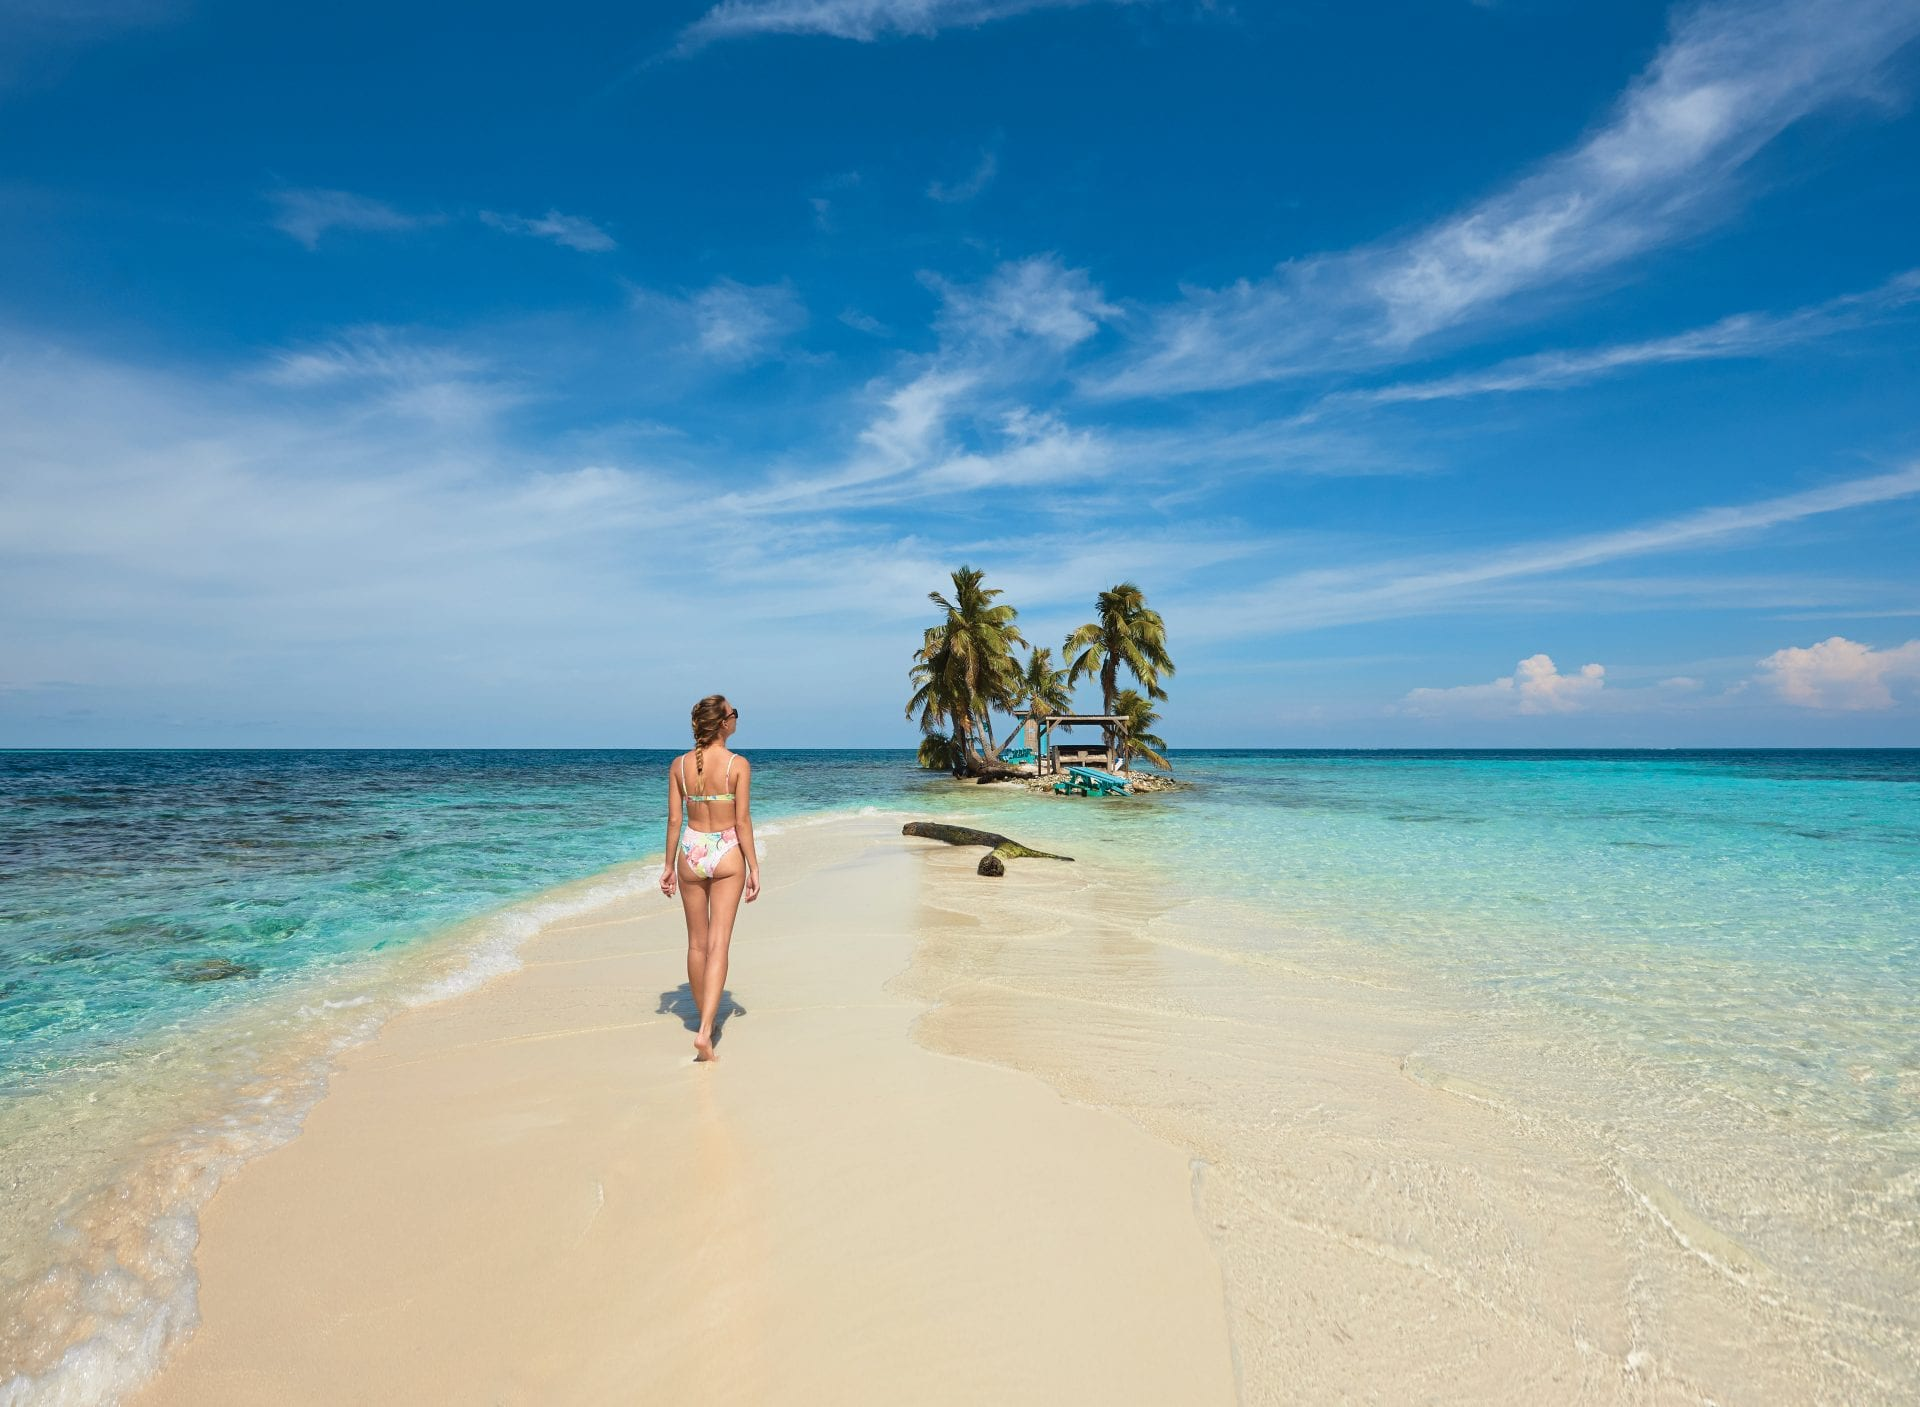 belize open caribbean tourism caribbean